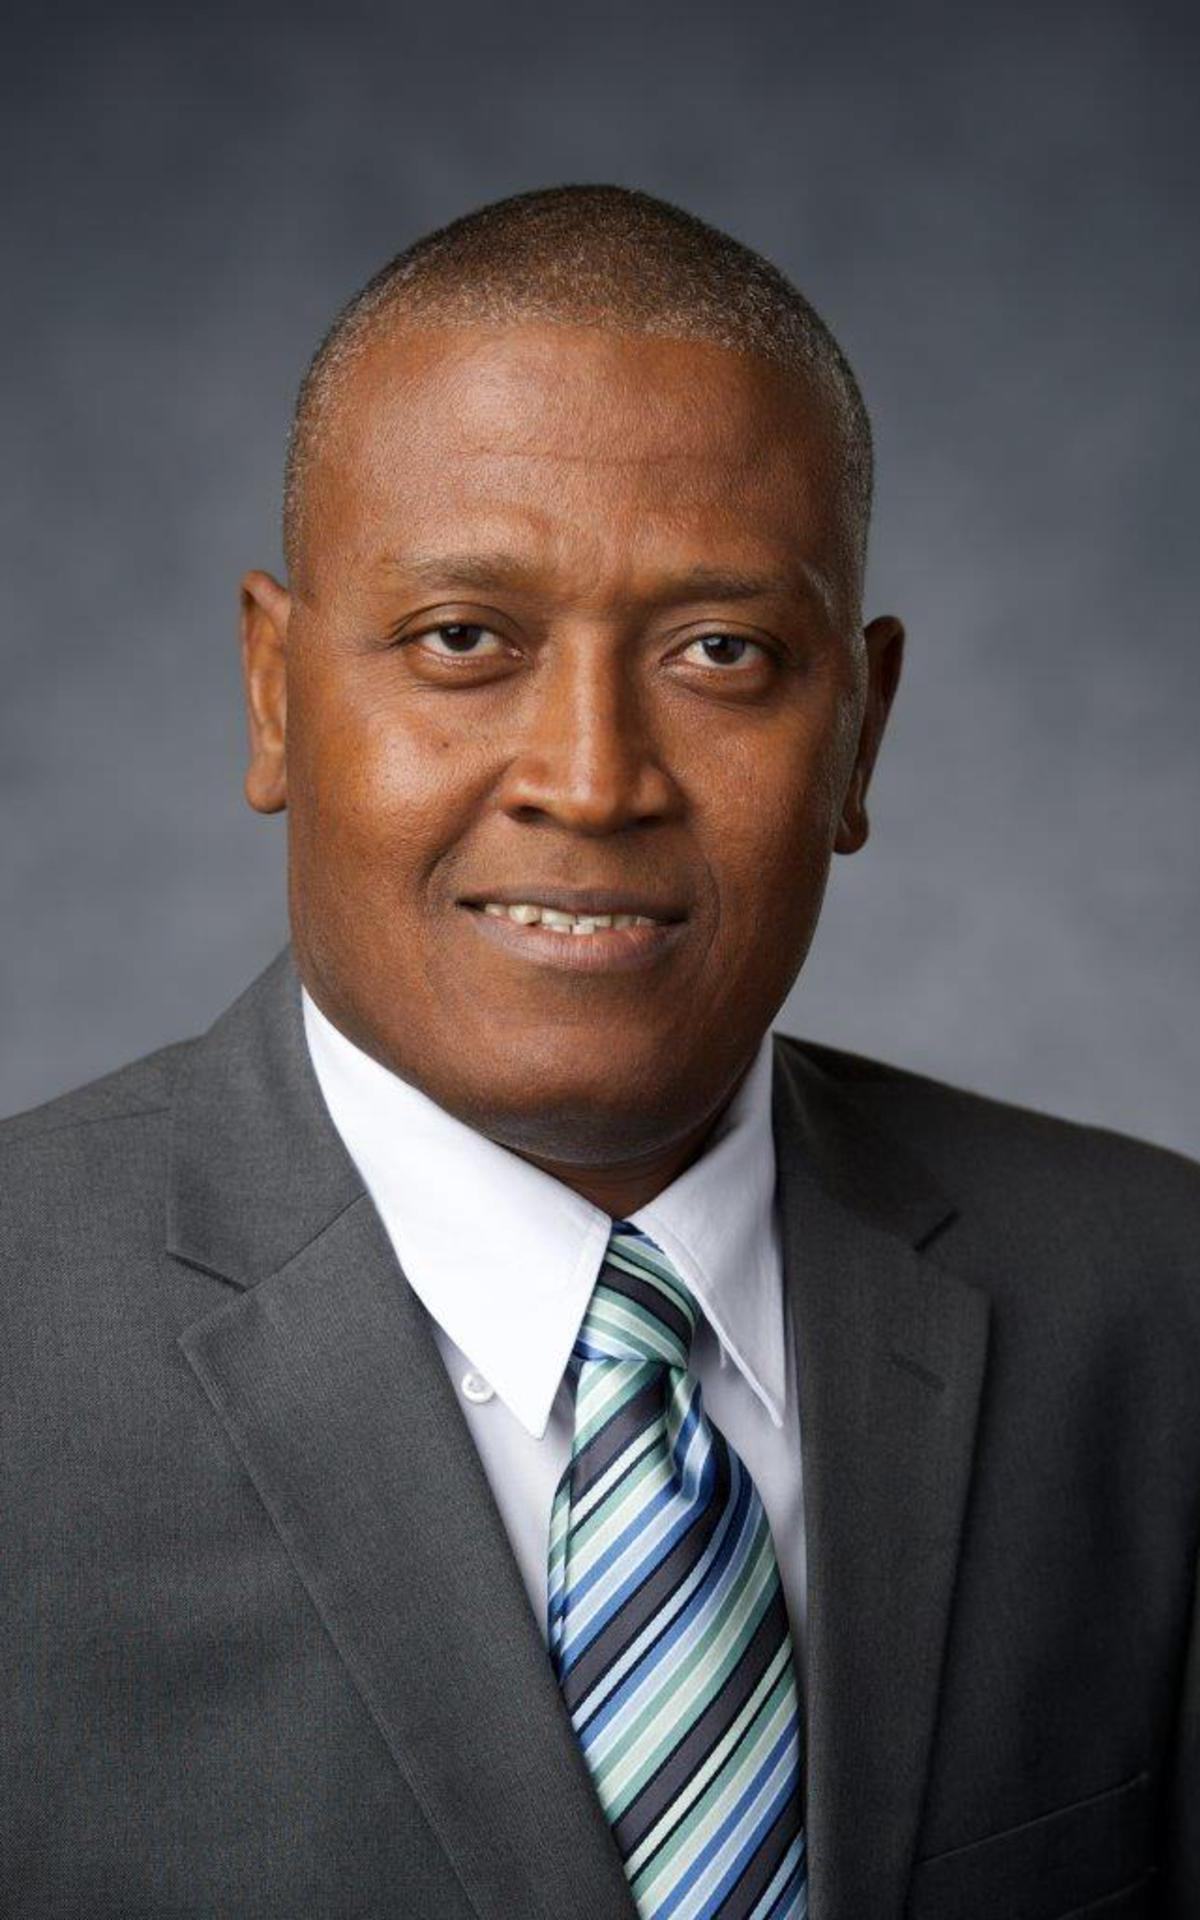 Elder Bien-Aimé